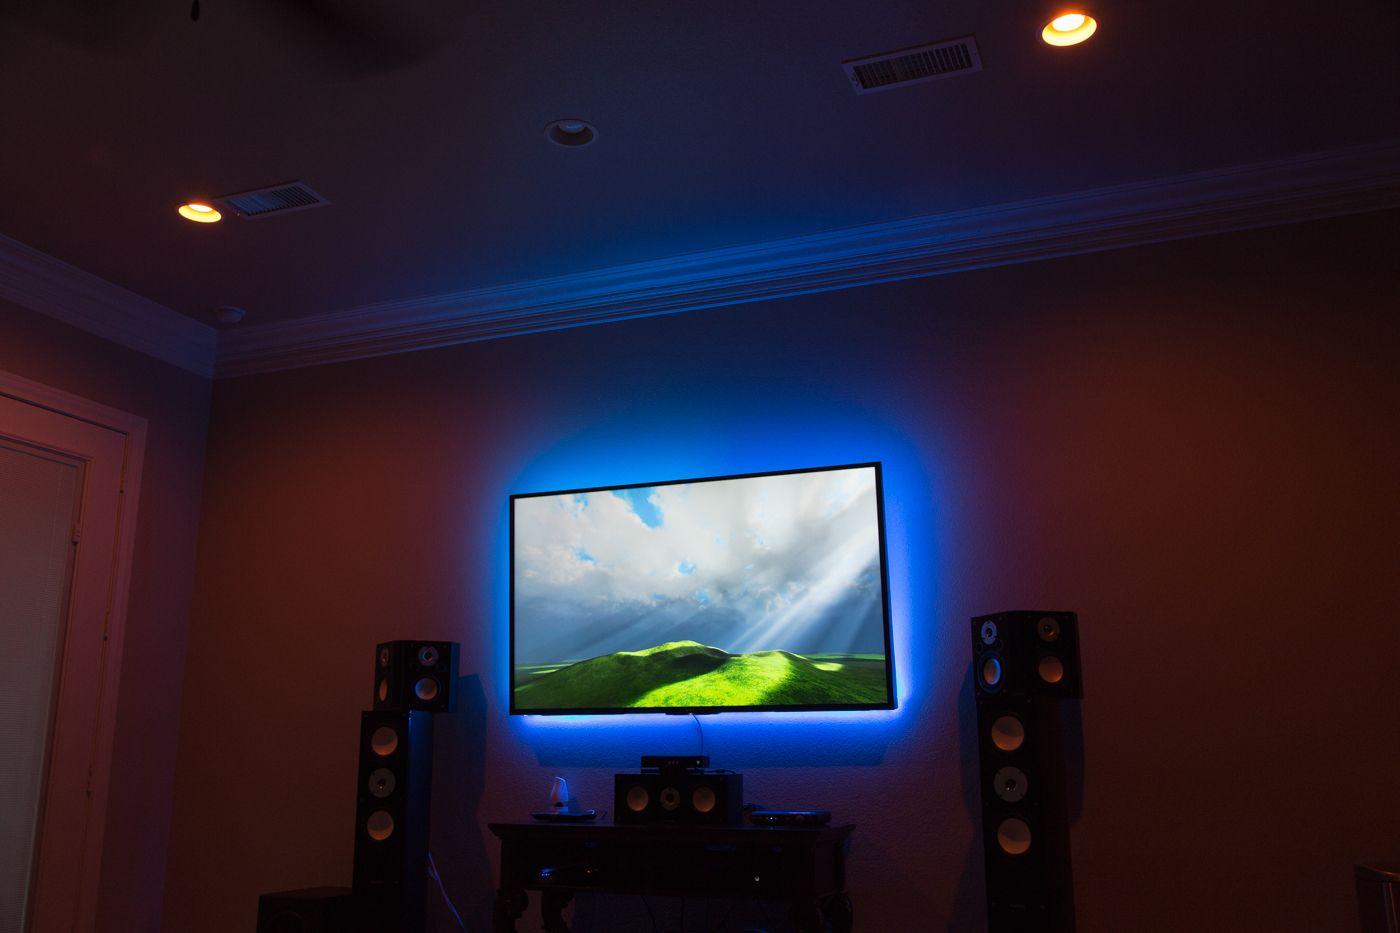 Philips Hue Behind Tv.Hue Lightsrips Behind Tv Google Search Living Room